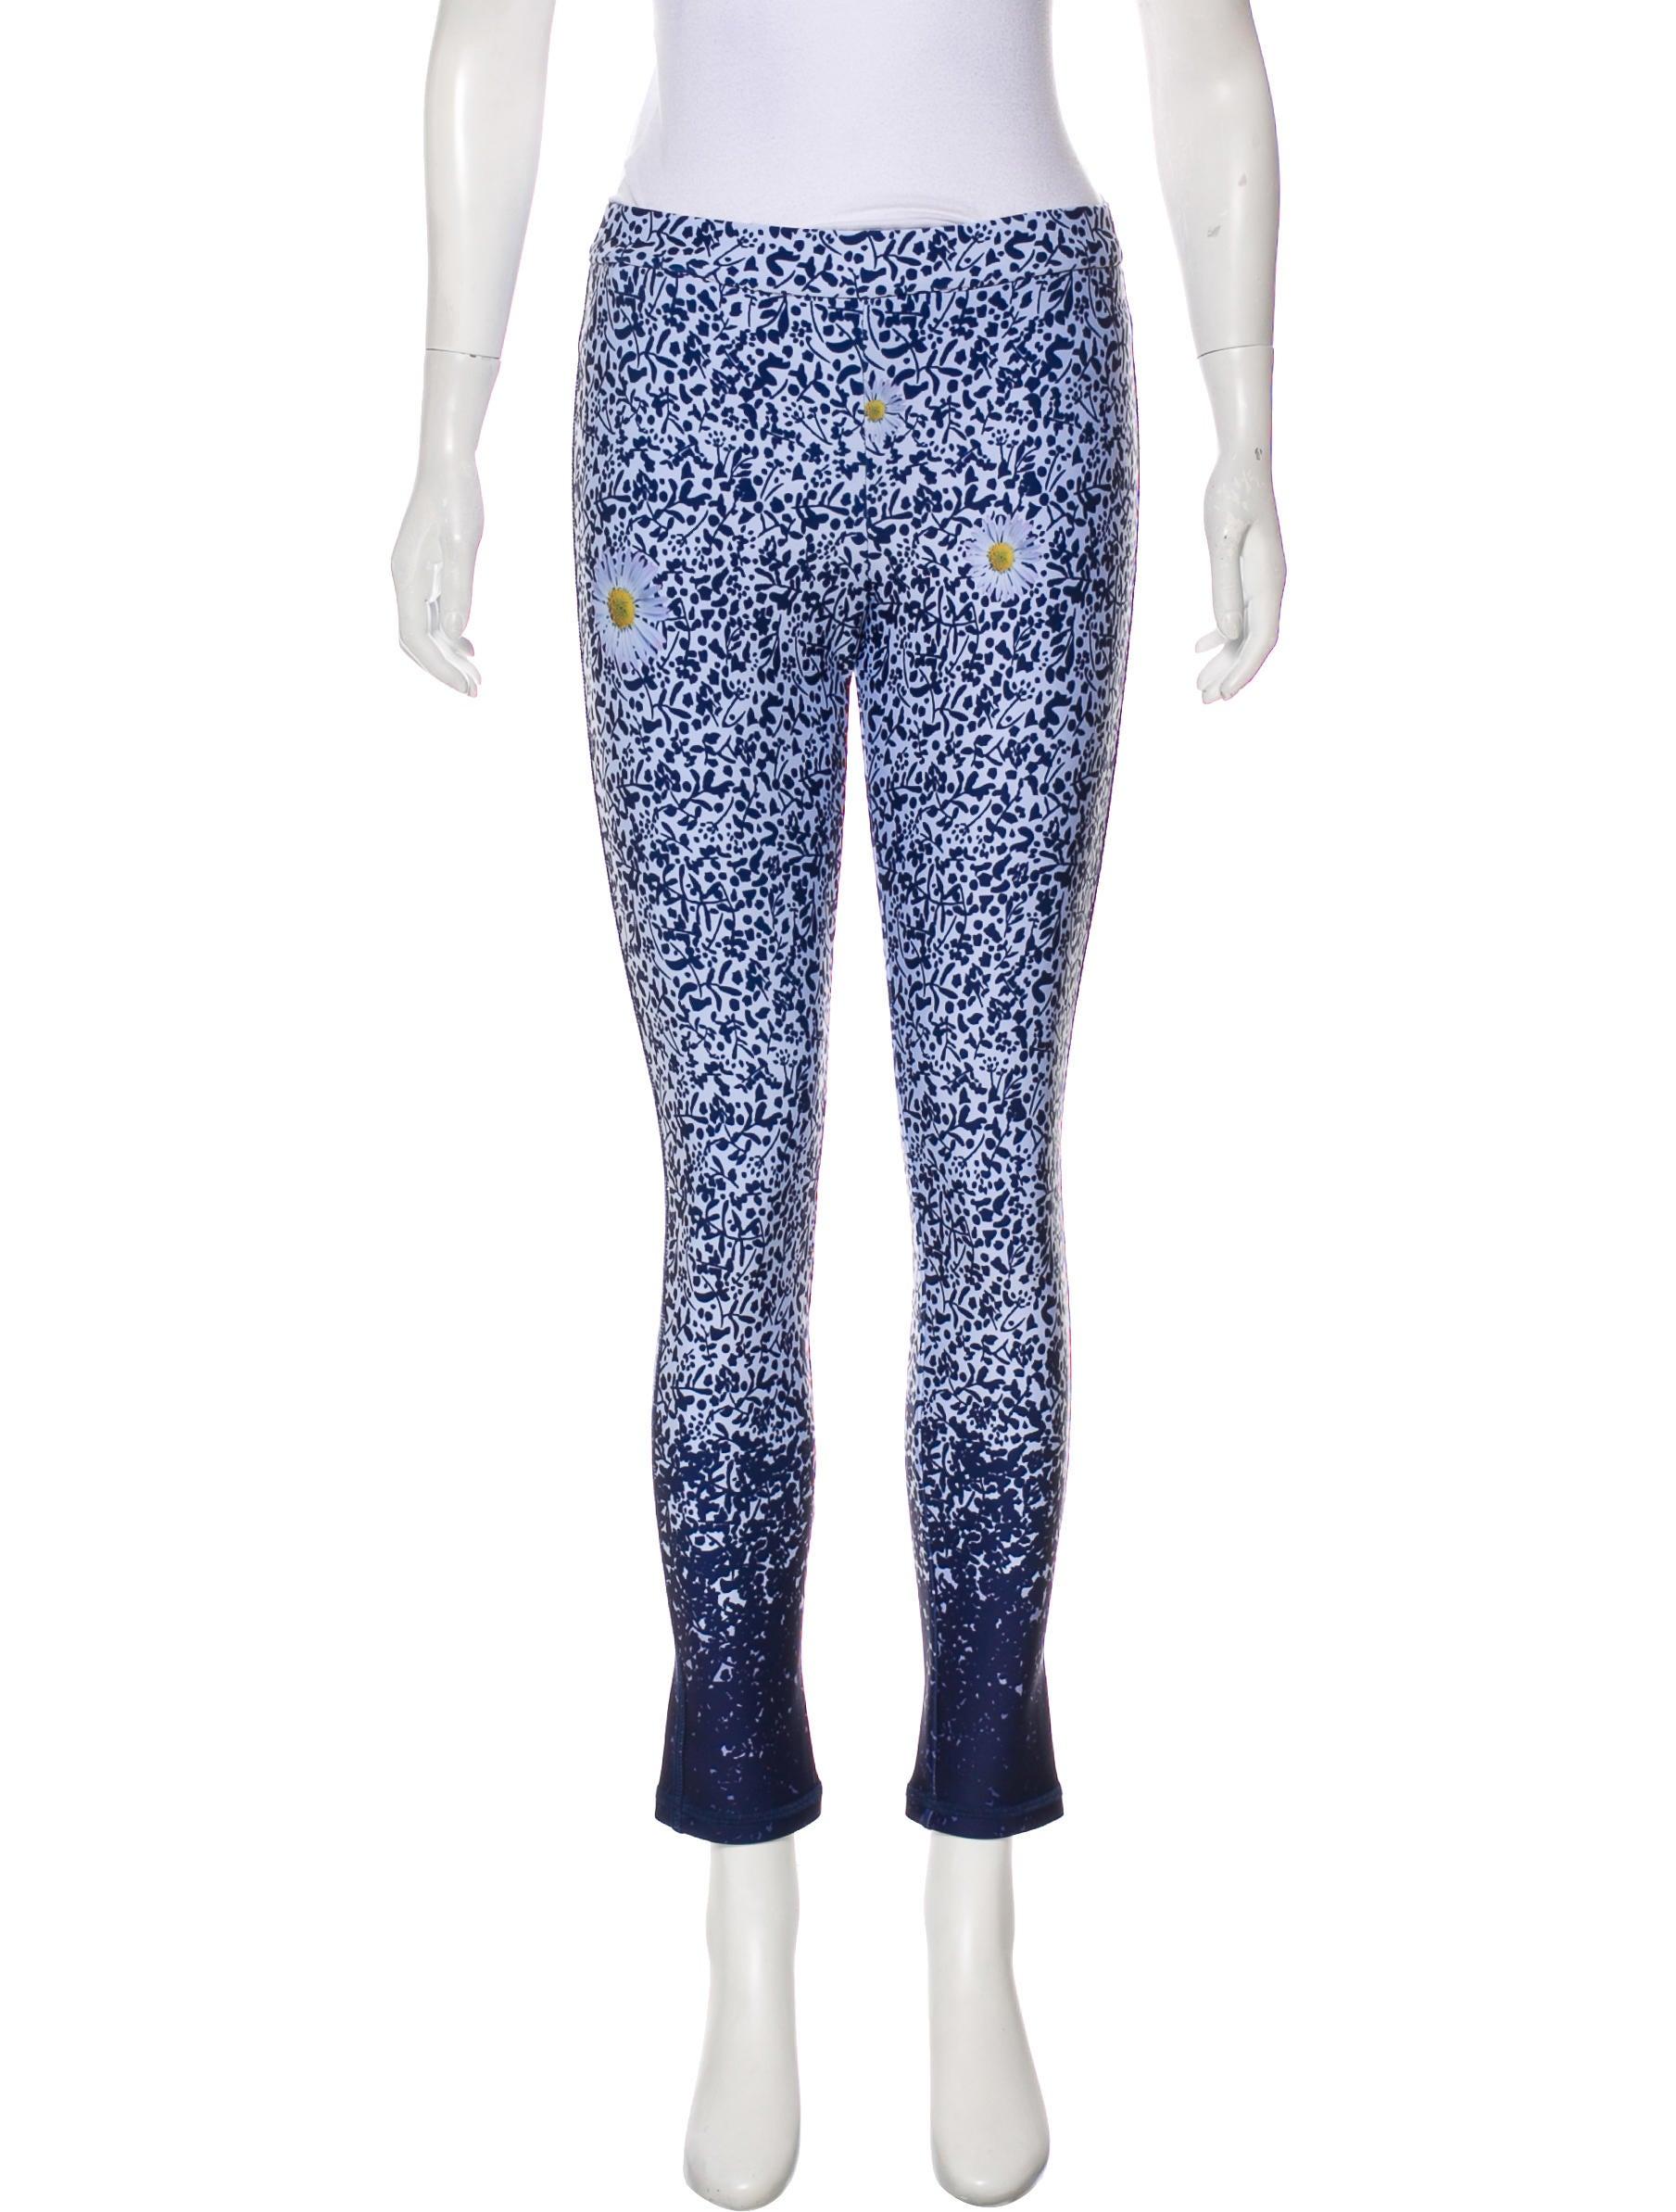 18bb40616fd887 Cynthia Rowley Printed Mid-Rise Pants w  Tags - Clothing - WCY20943 ...